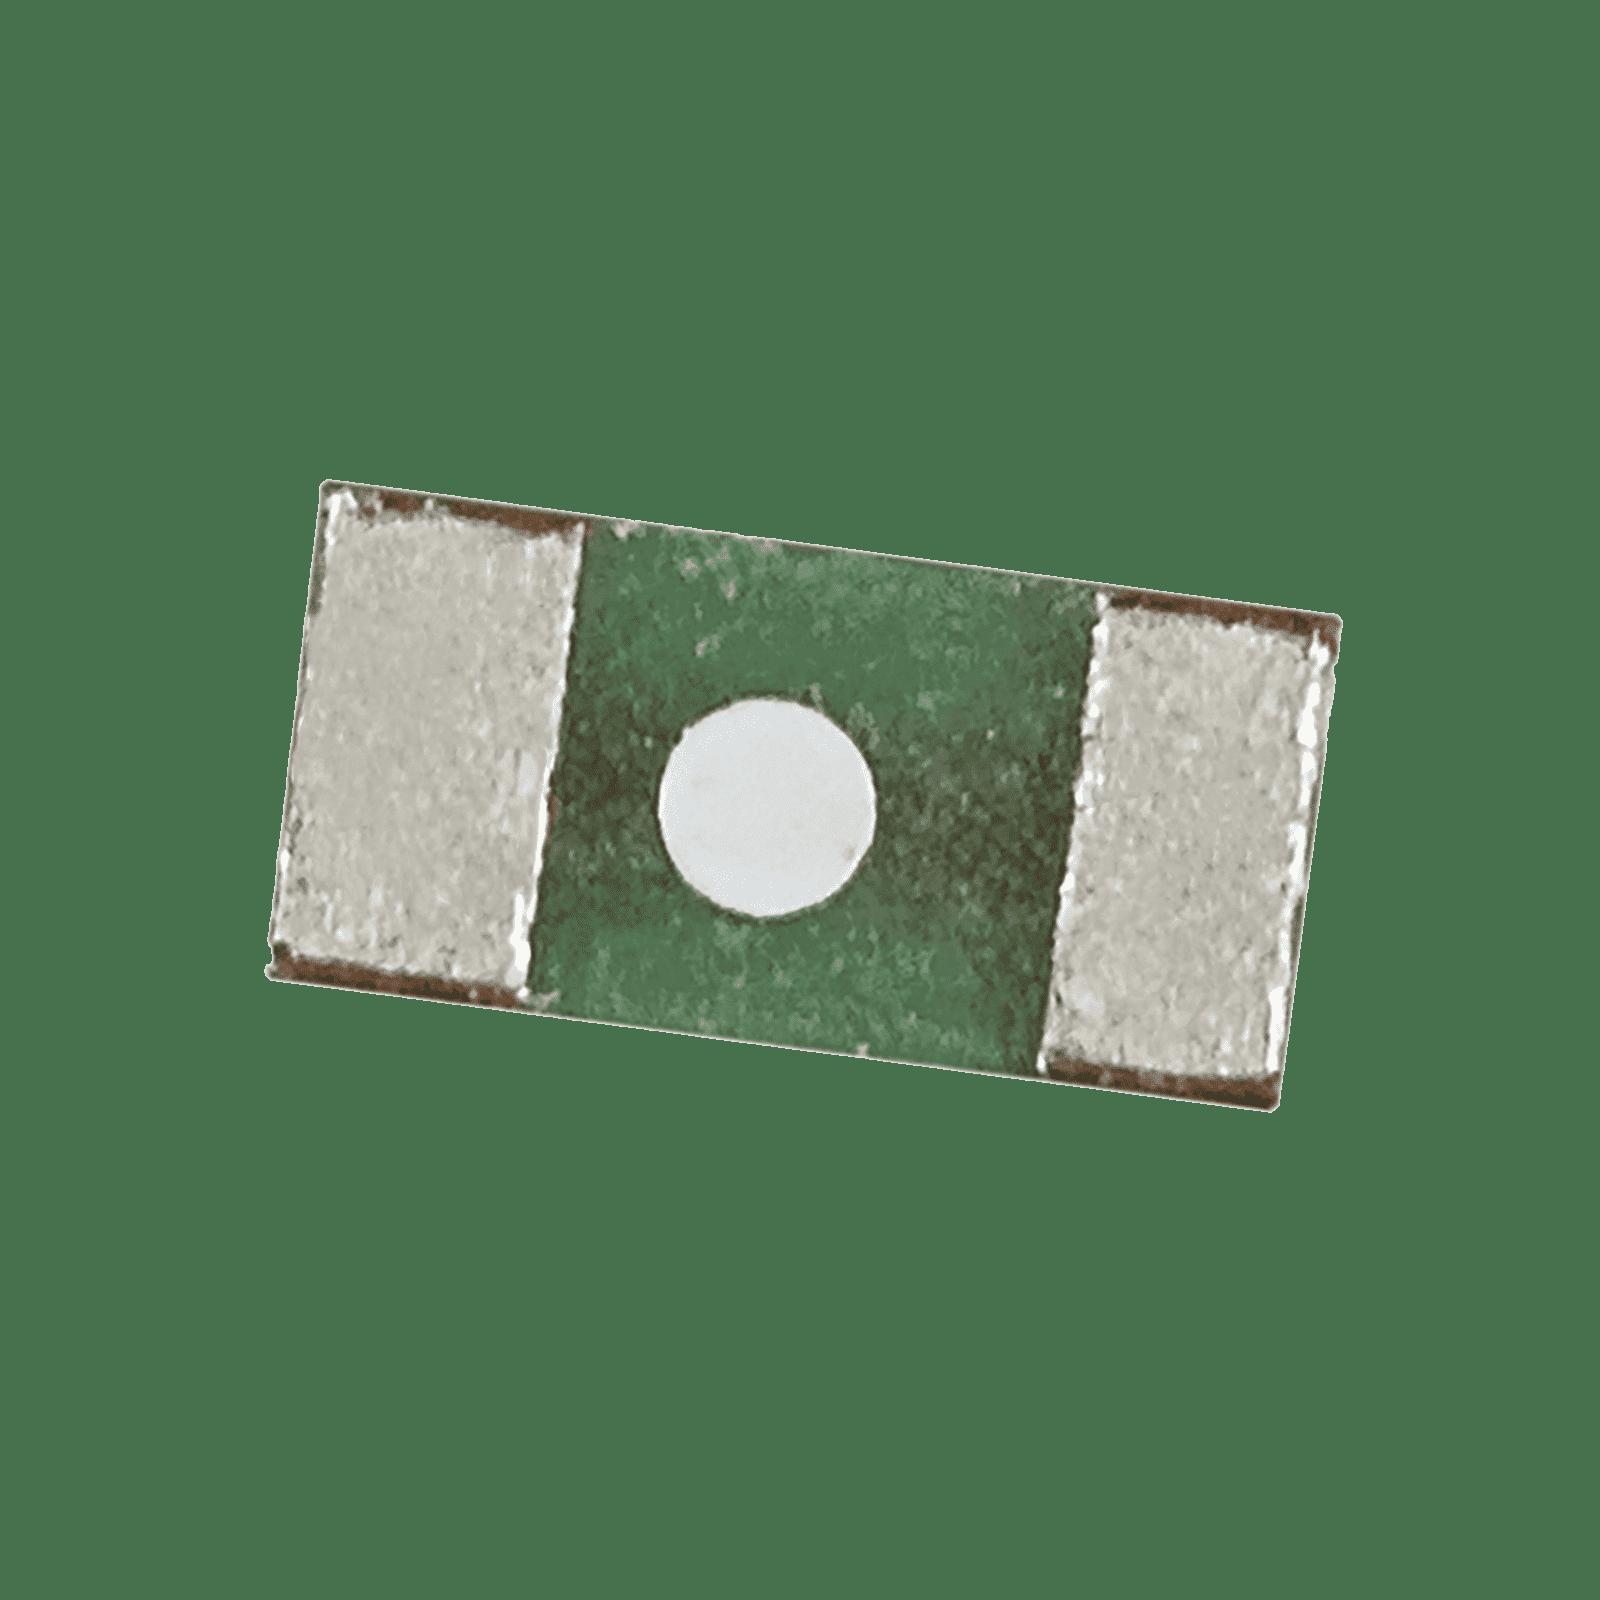 Fuse smd smt fuse 0402 2a 32v backlight macbook backlight point